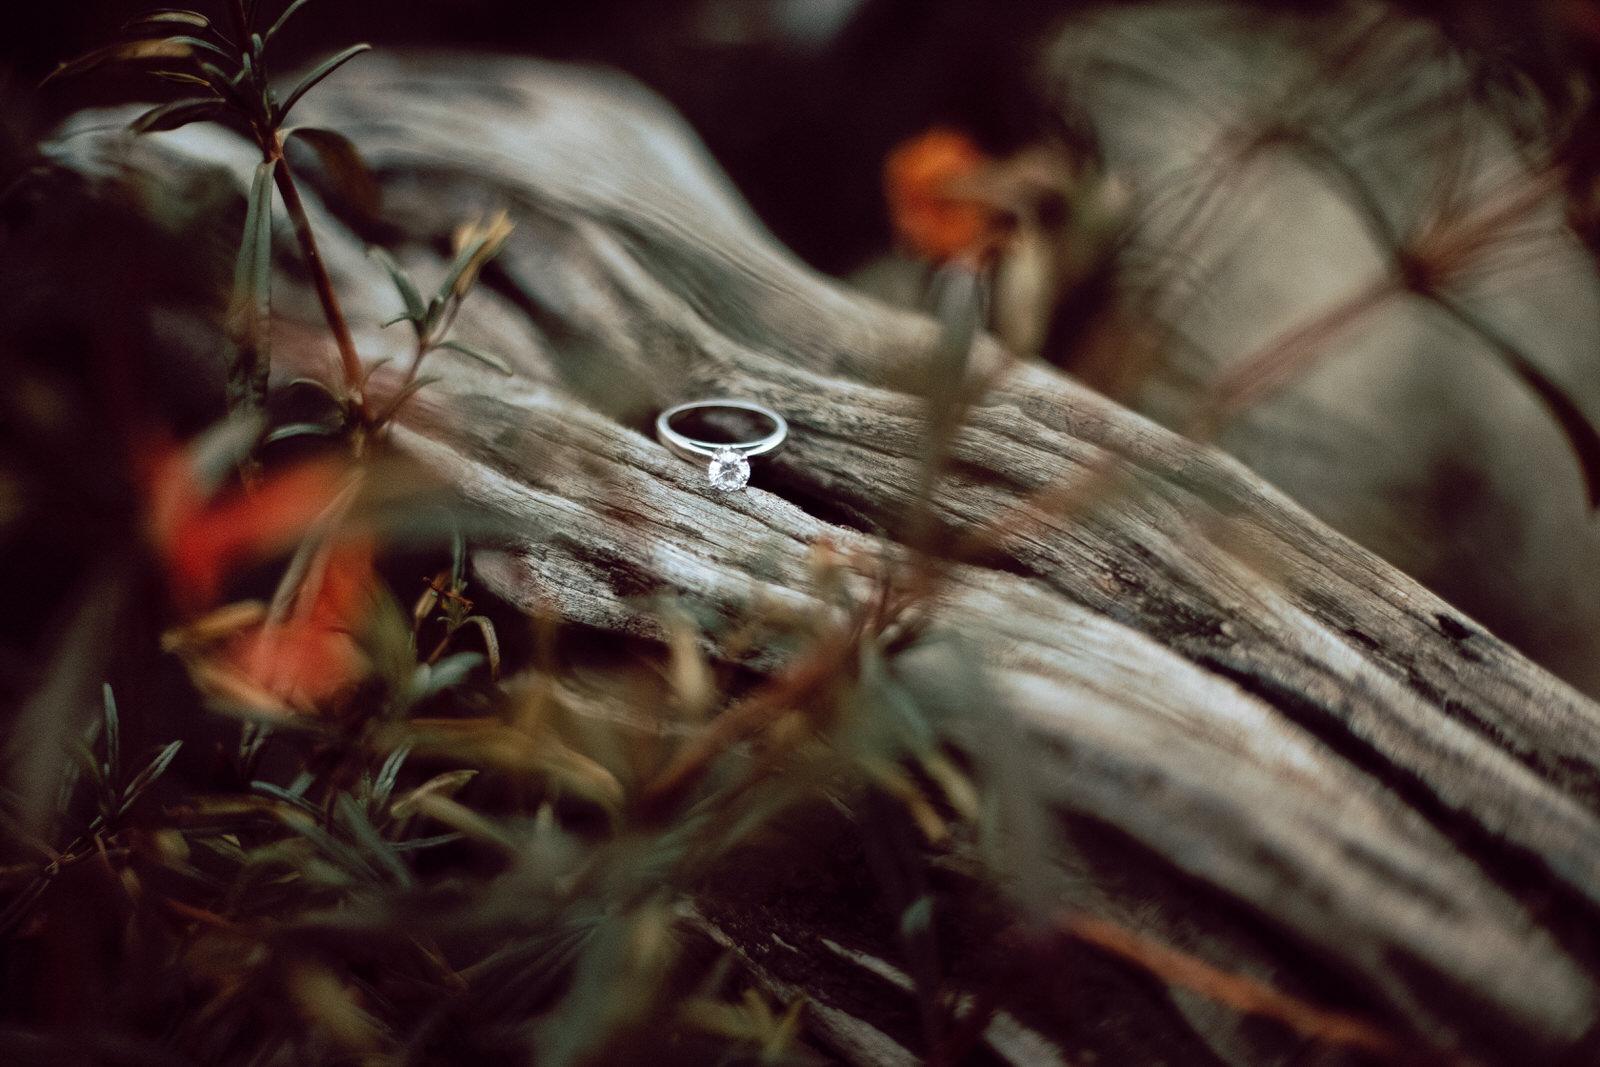 A diamond wedding ring resting on a cypress tree branch